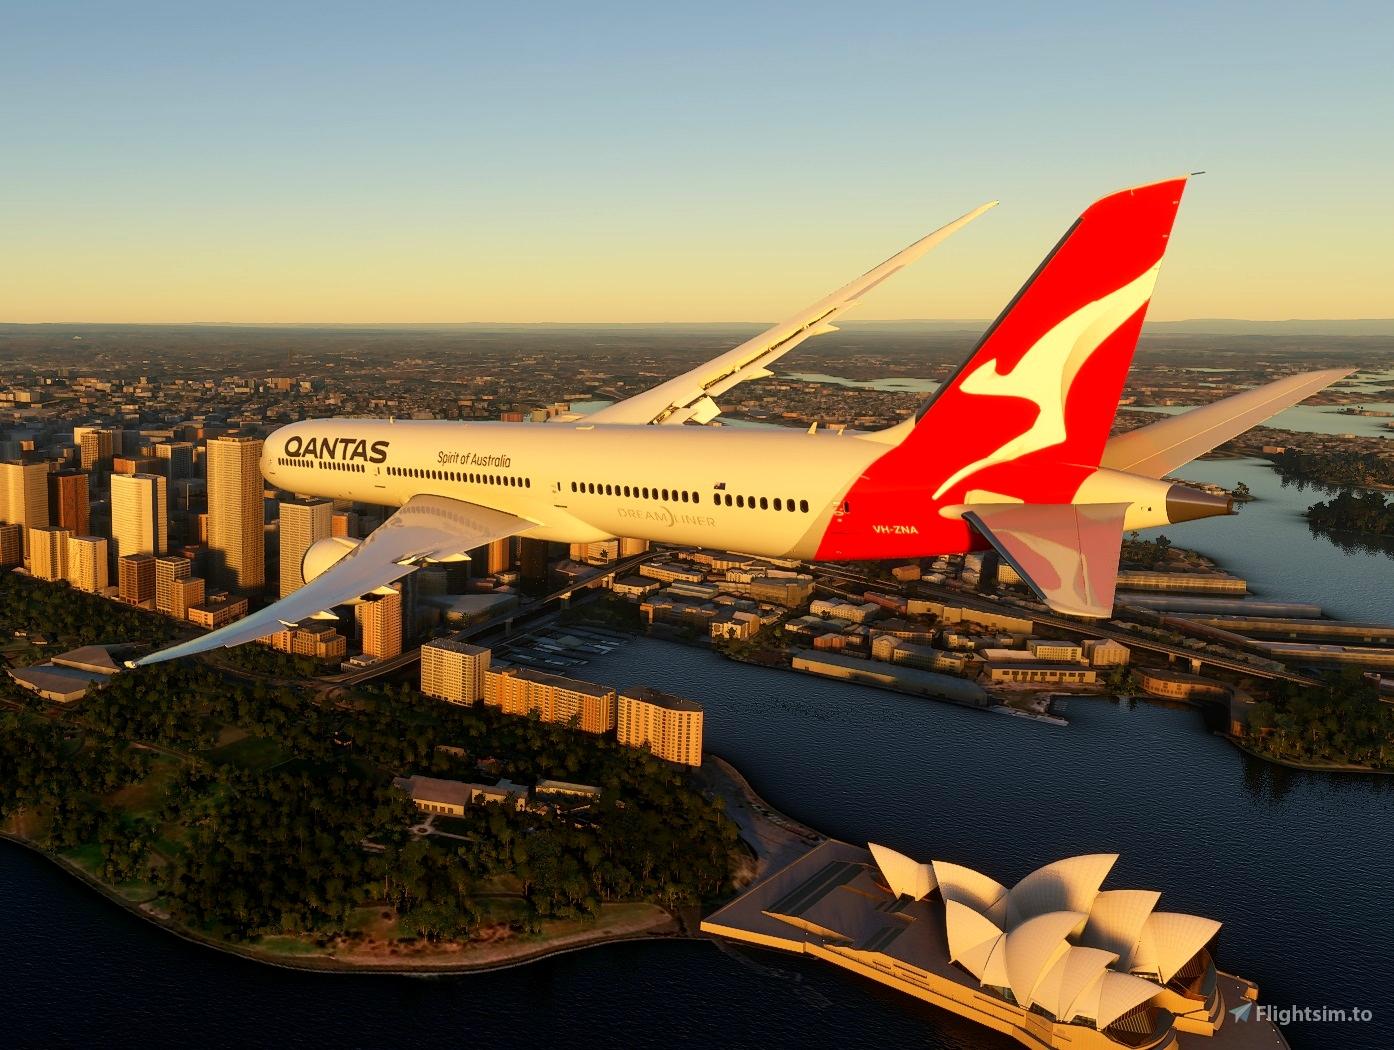 Boeing 787-10 Qantas